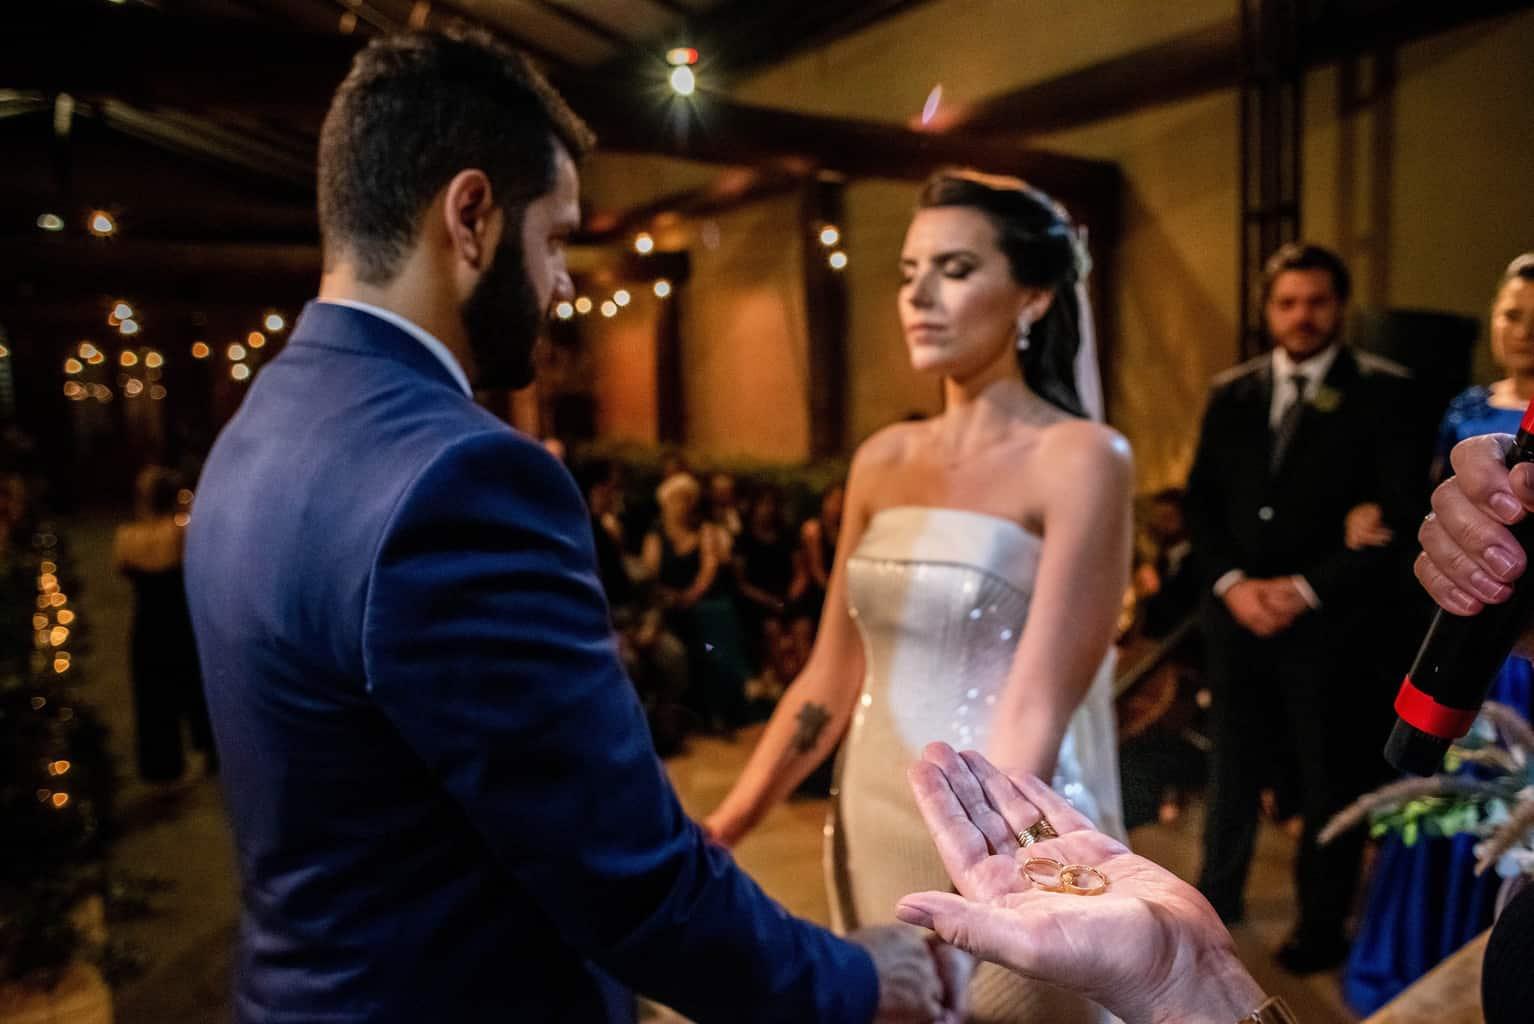 Bel-Benkler-eventos-Casamento-Ariane-e-Matheus-cerimonia-decoracao-contemporanea-fotografia-Rafael-Bigarelli-noivos-na-pista-Spazio-Giardini-41